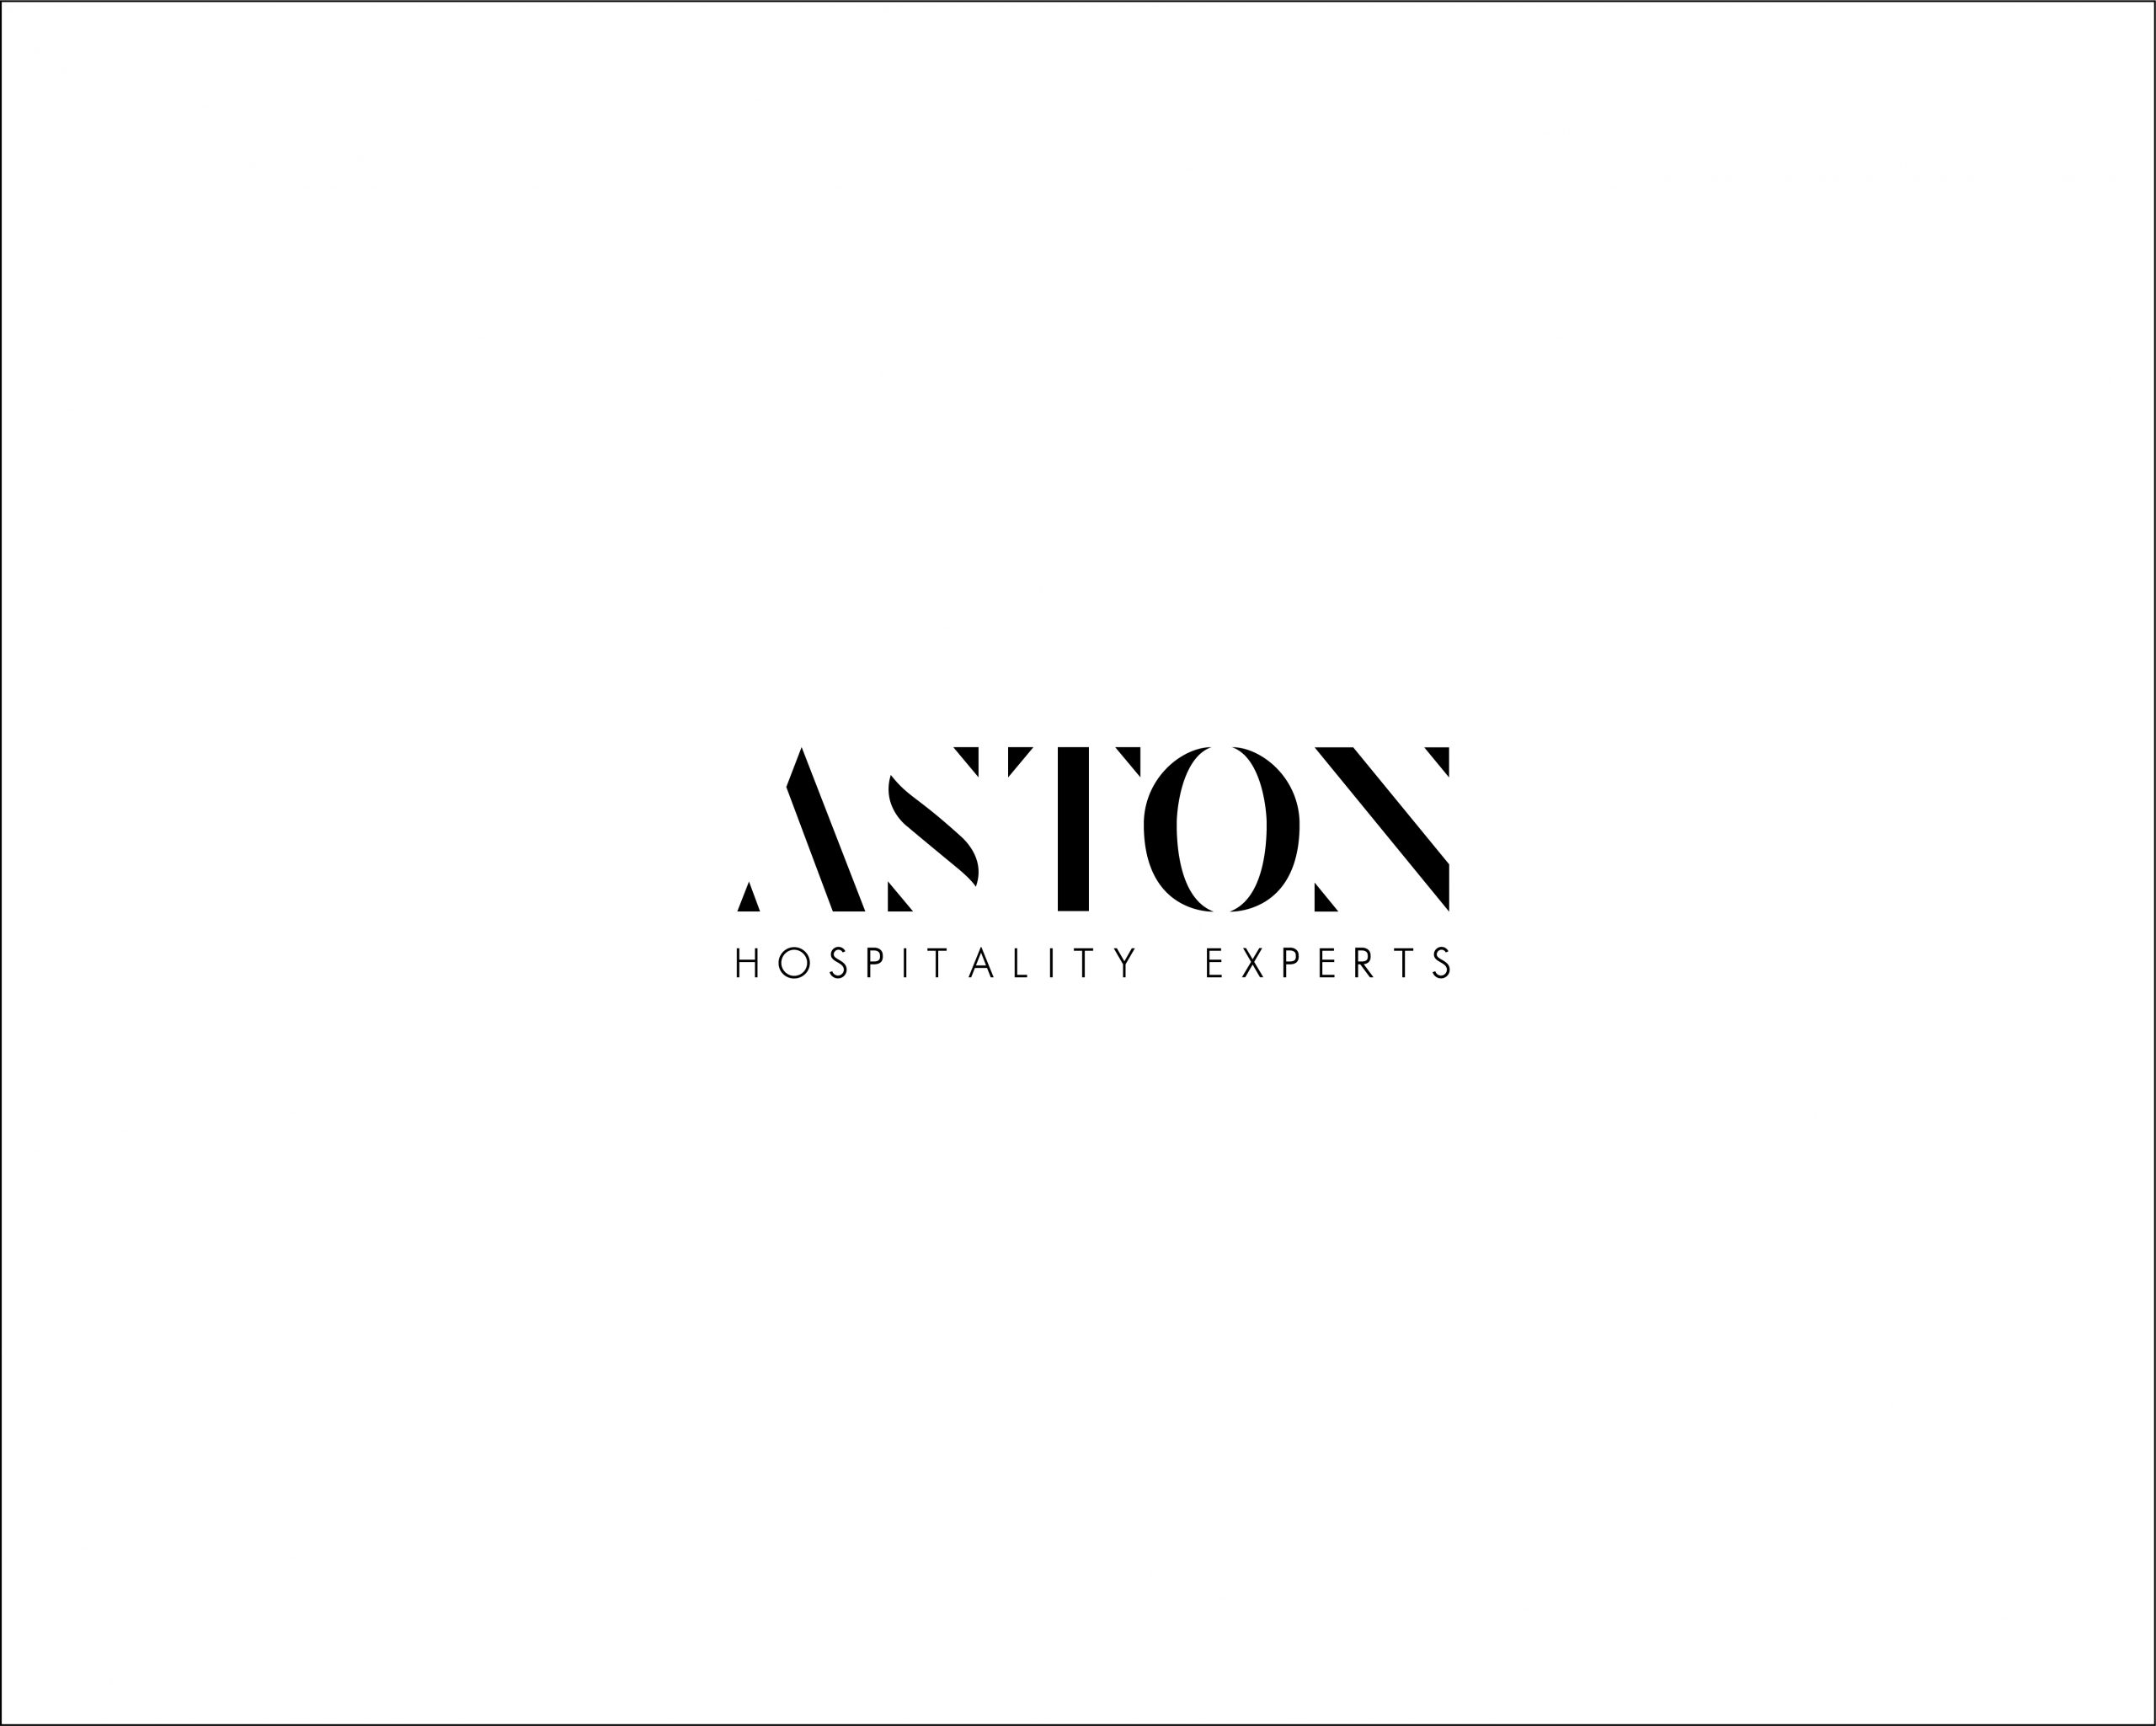 Aston Hospitality Experts